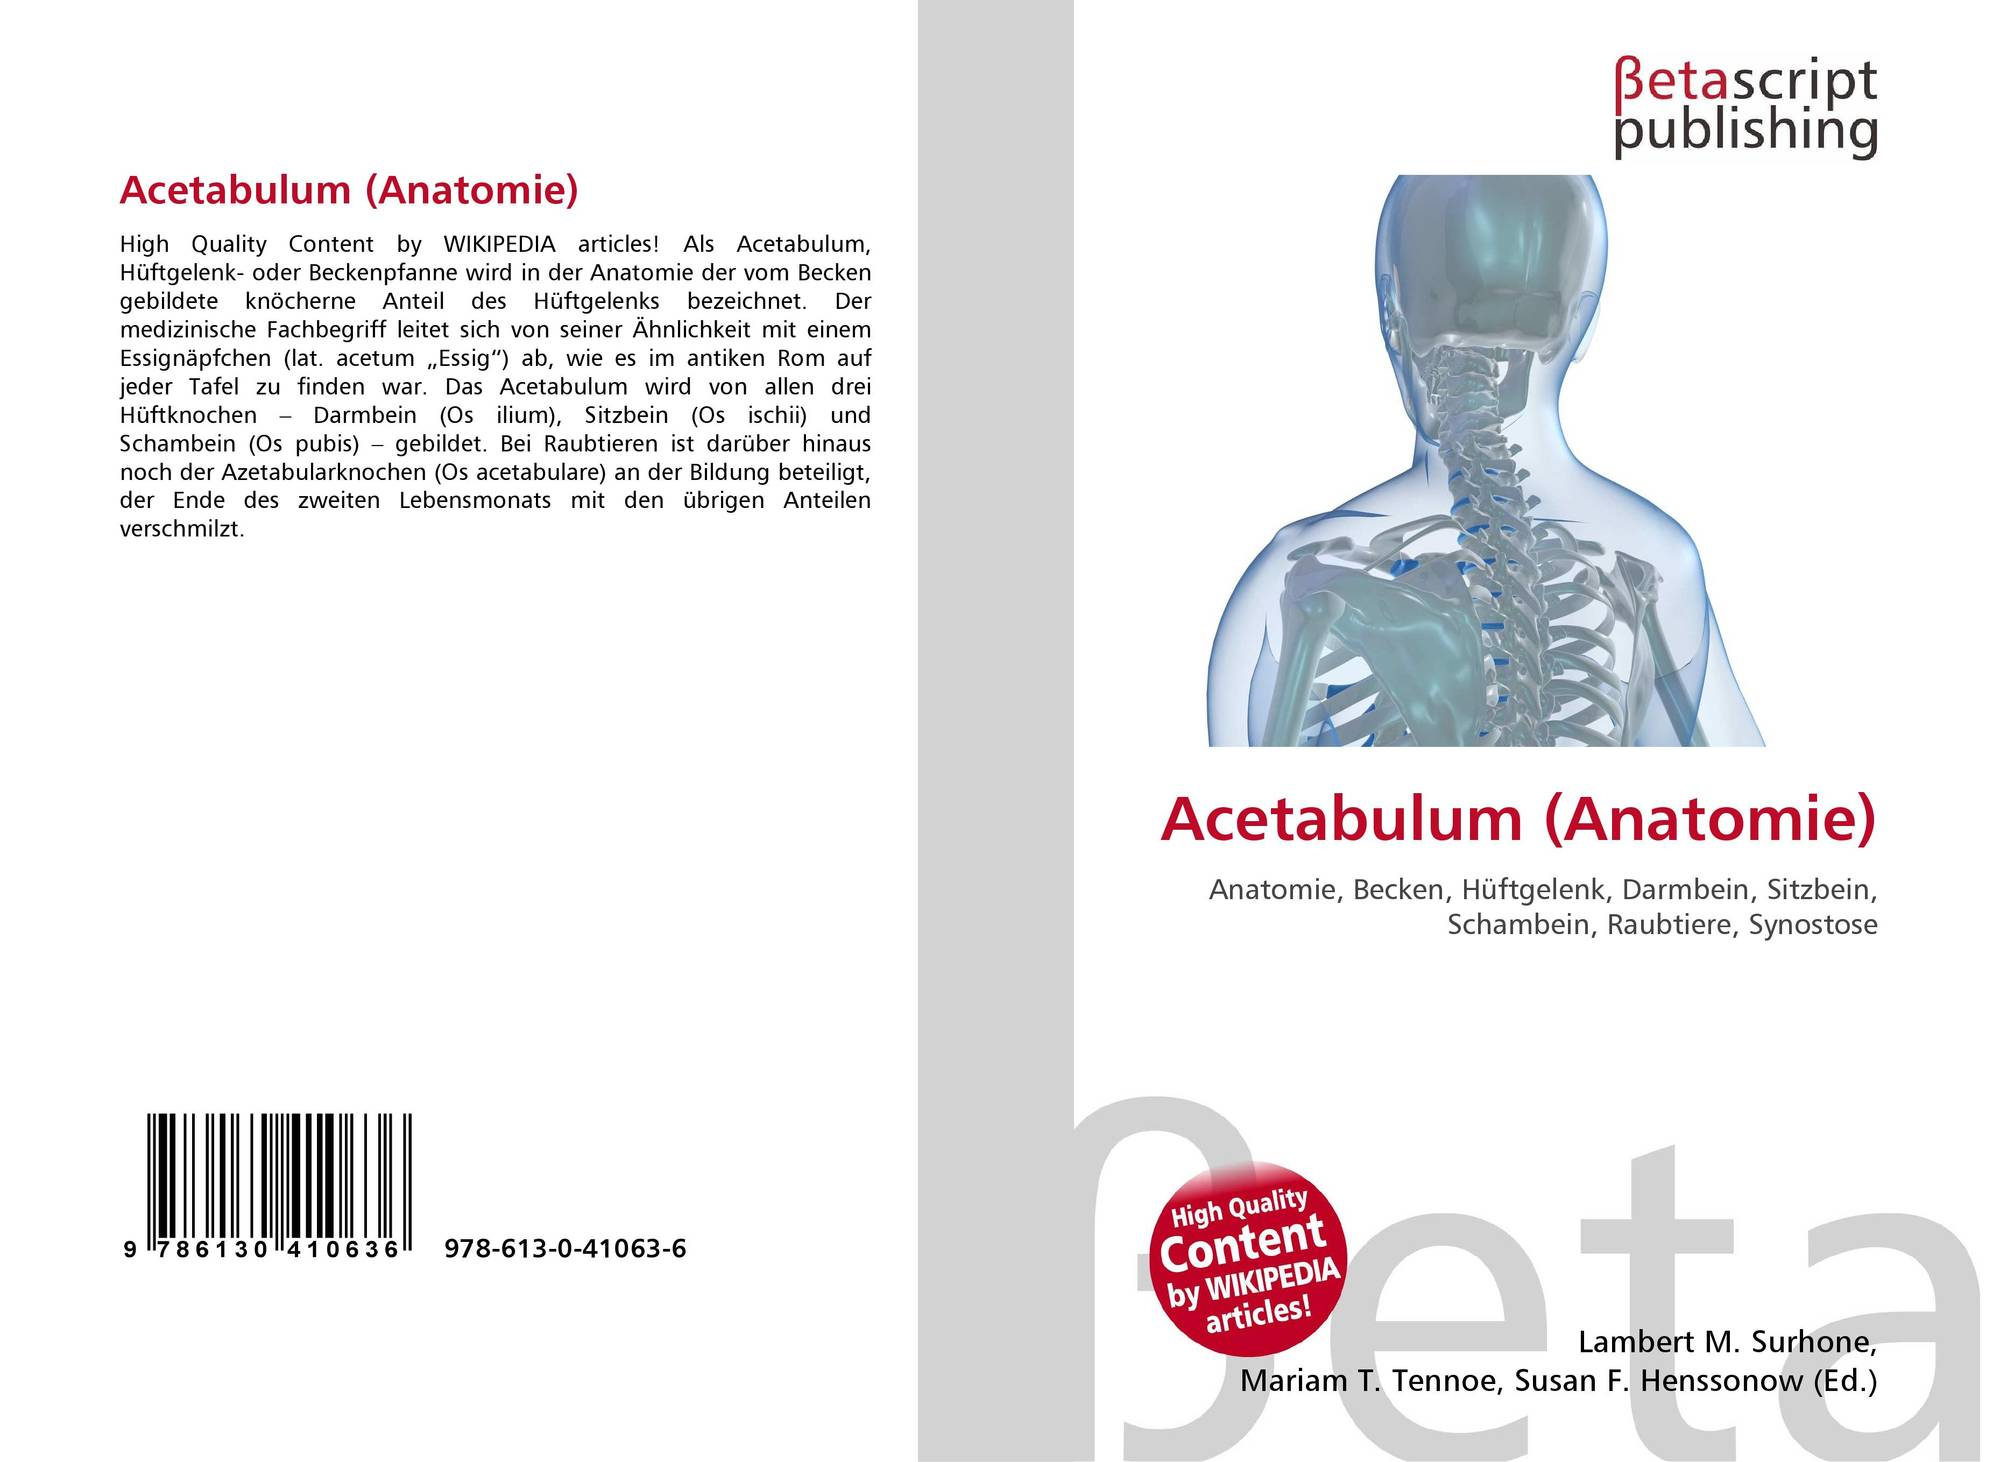 Acetabulum (Anatomie), 978-613-0-41063-6, 6130410638 ,9786130410636